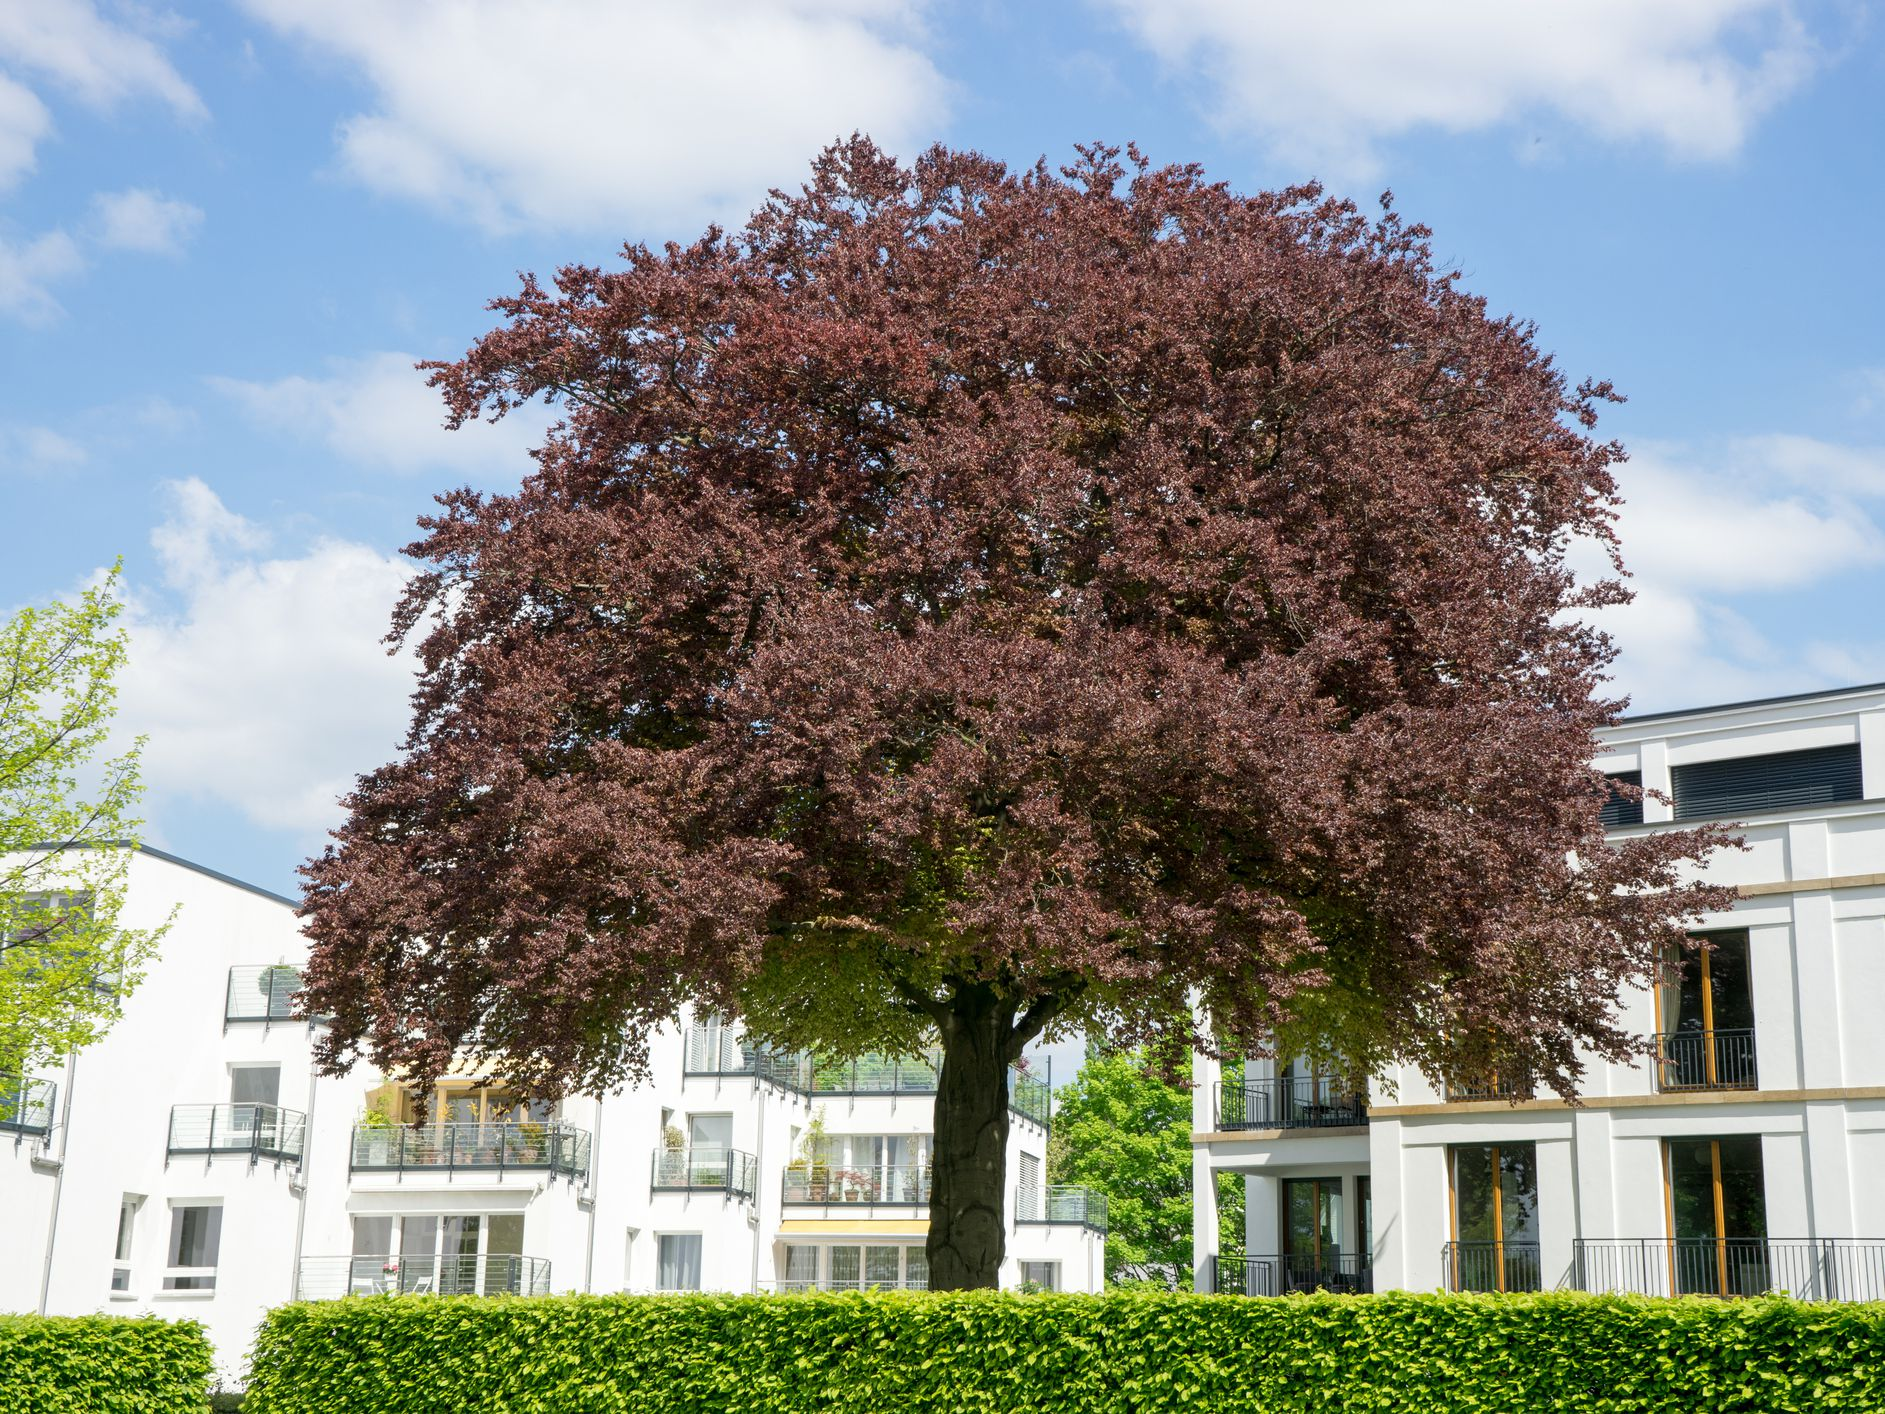 Popular Front Yard Landscape Trees